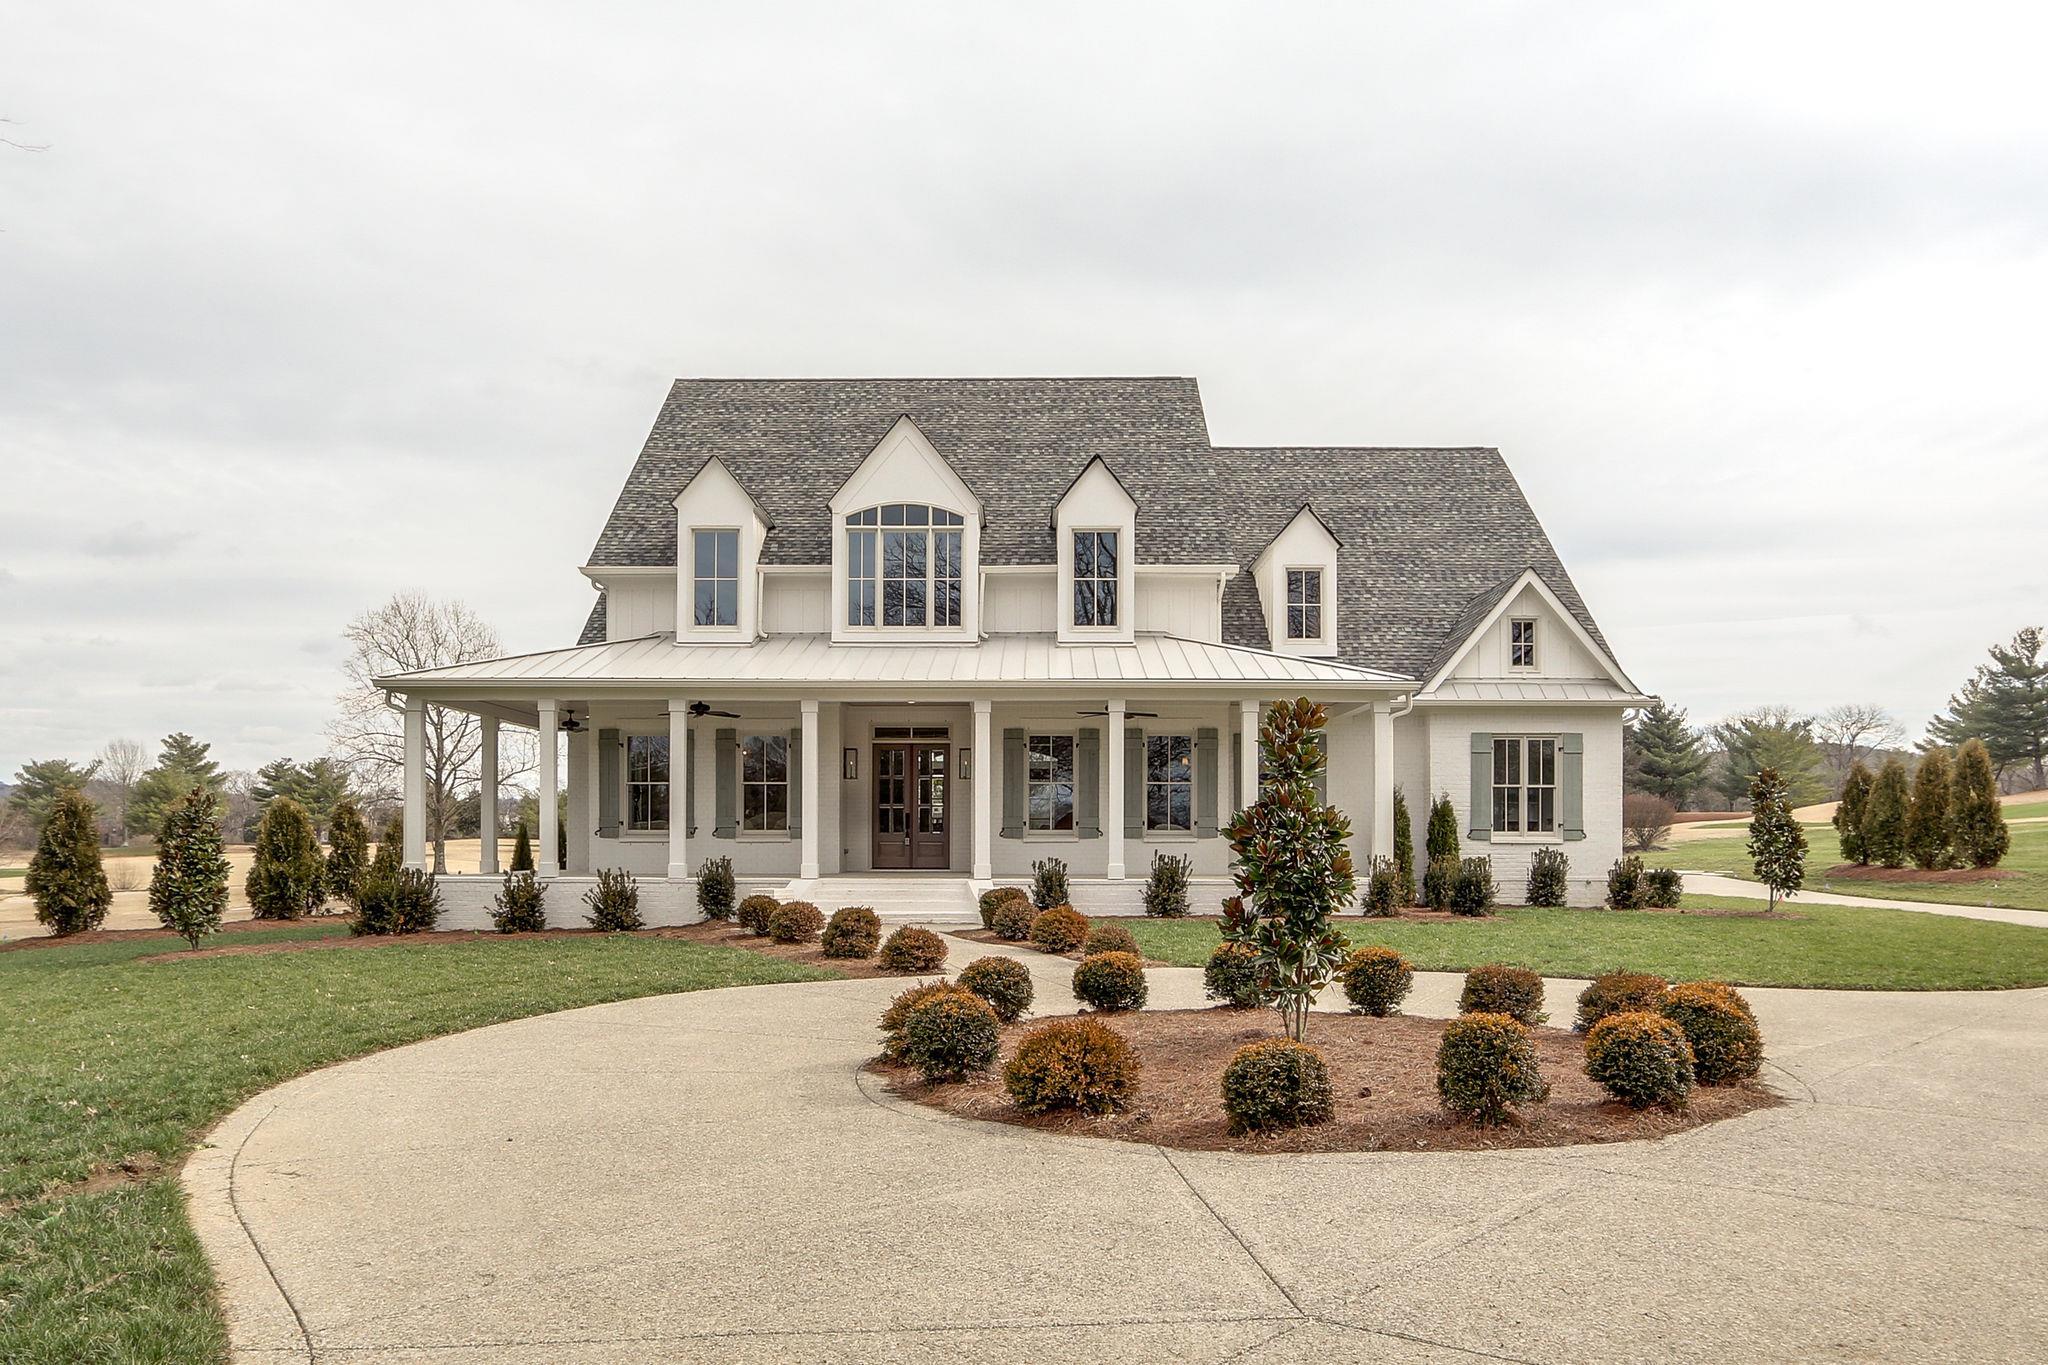 1714 Andrew Crockett Ct *Lot 1*, Brentwood, TN 37027 - Brentwood, TN real estate listing